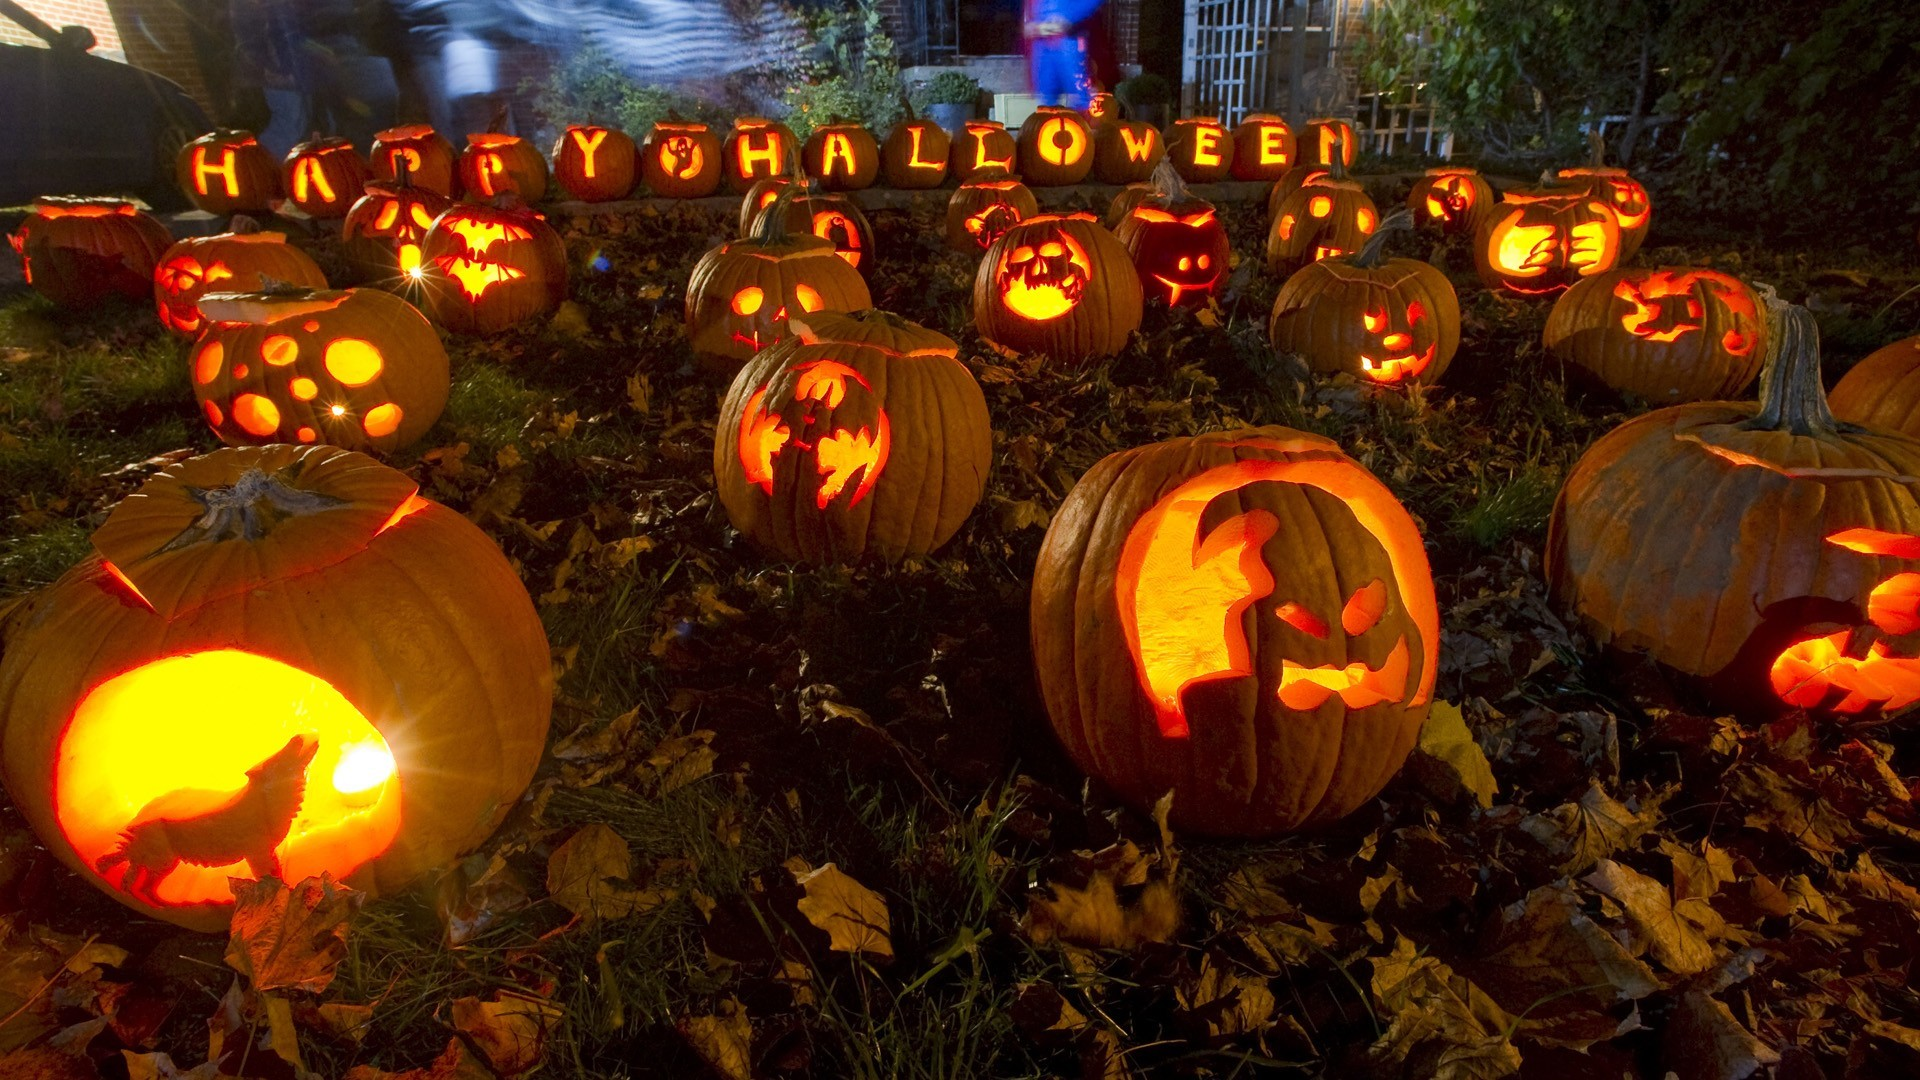 Download Wallpaper Halloween Batman - 1186818-halloween-wallpaper-desktop-1920x1080-phone  Photograph_594299.jpg